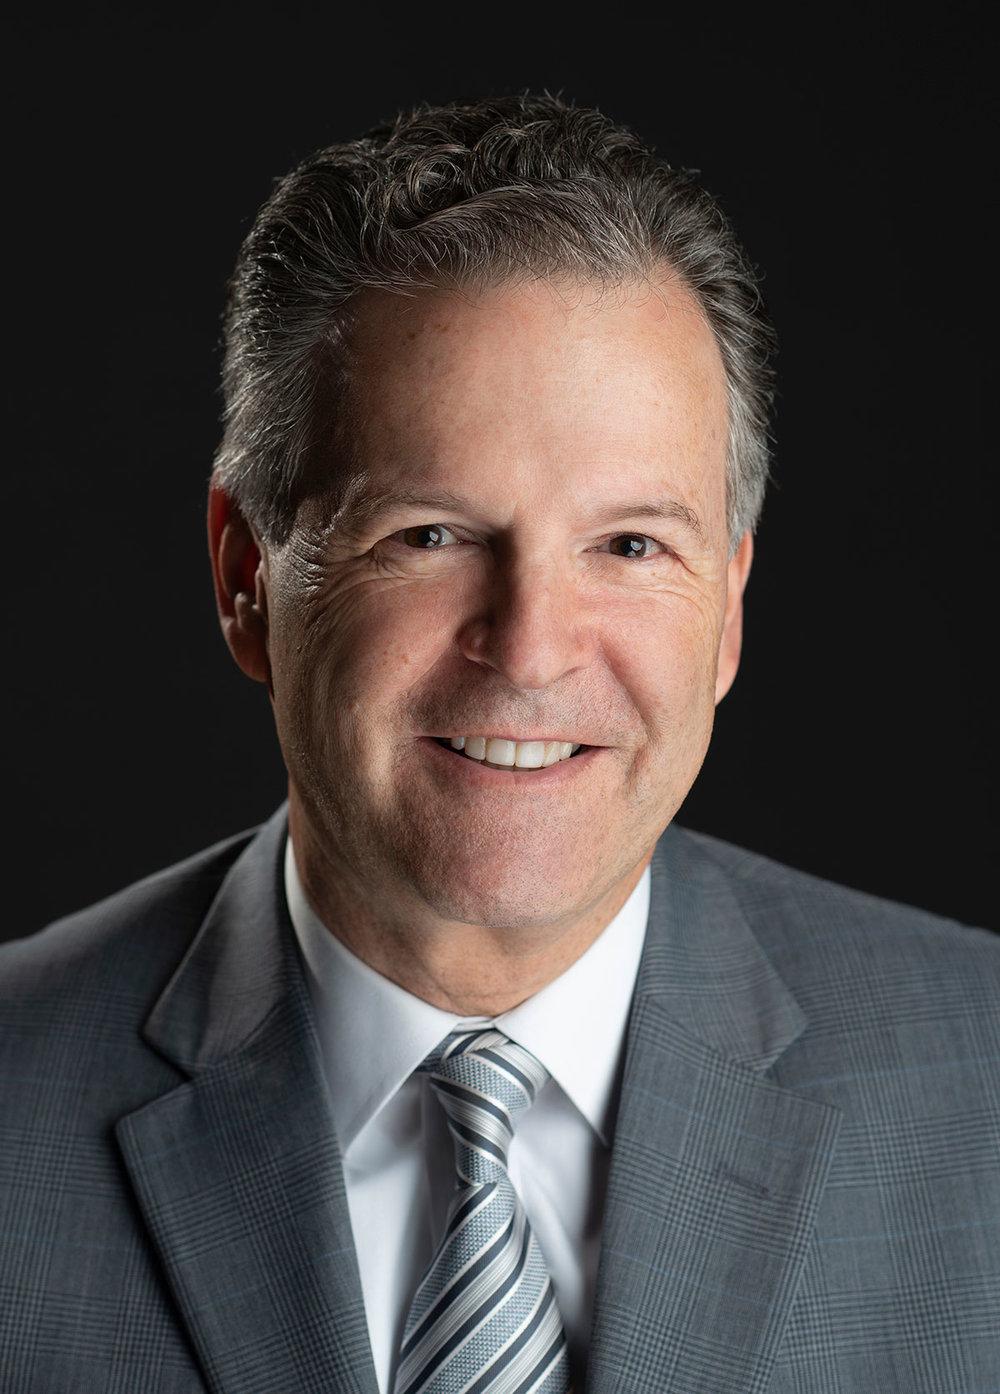 Corporate headshot of man wearing gray suite